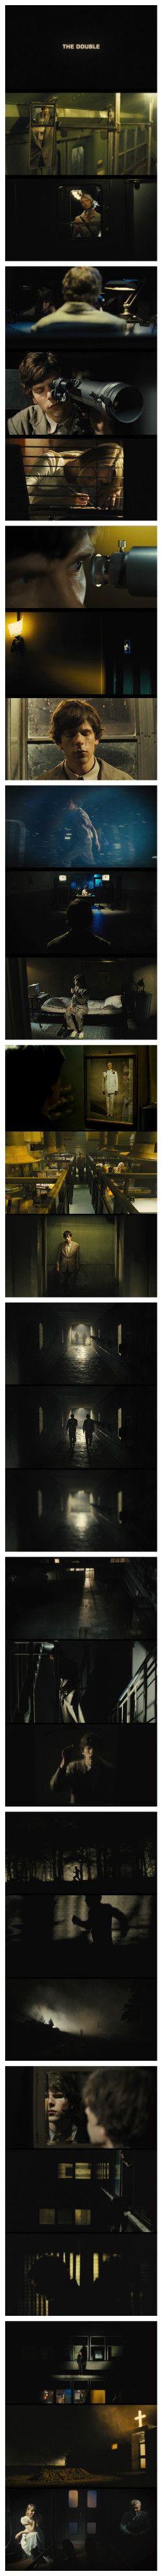 The Double (2013) Directed by: Richard Ayoade Cinematography: Erik Wilson Cameras: Arricam ST/LT Format: 35mm (Kodak Vision3 200T 5213, Kodak Vision3 500T 5219) Mode: Spherical (3-perf) Aspect Ratio: 1.85:1